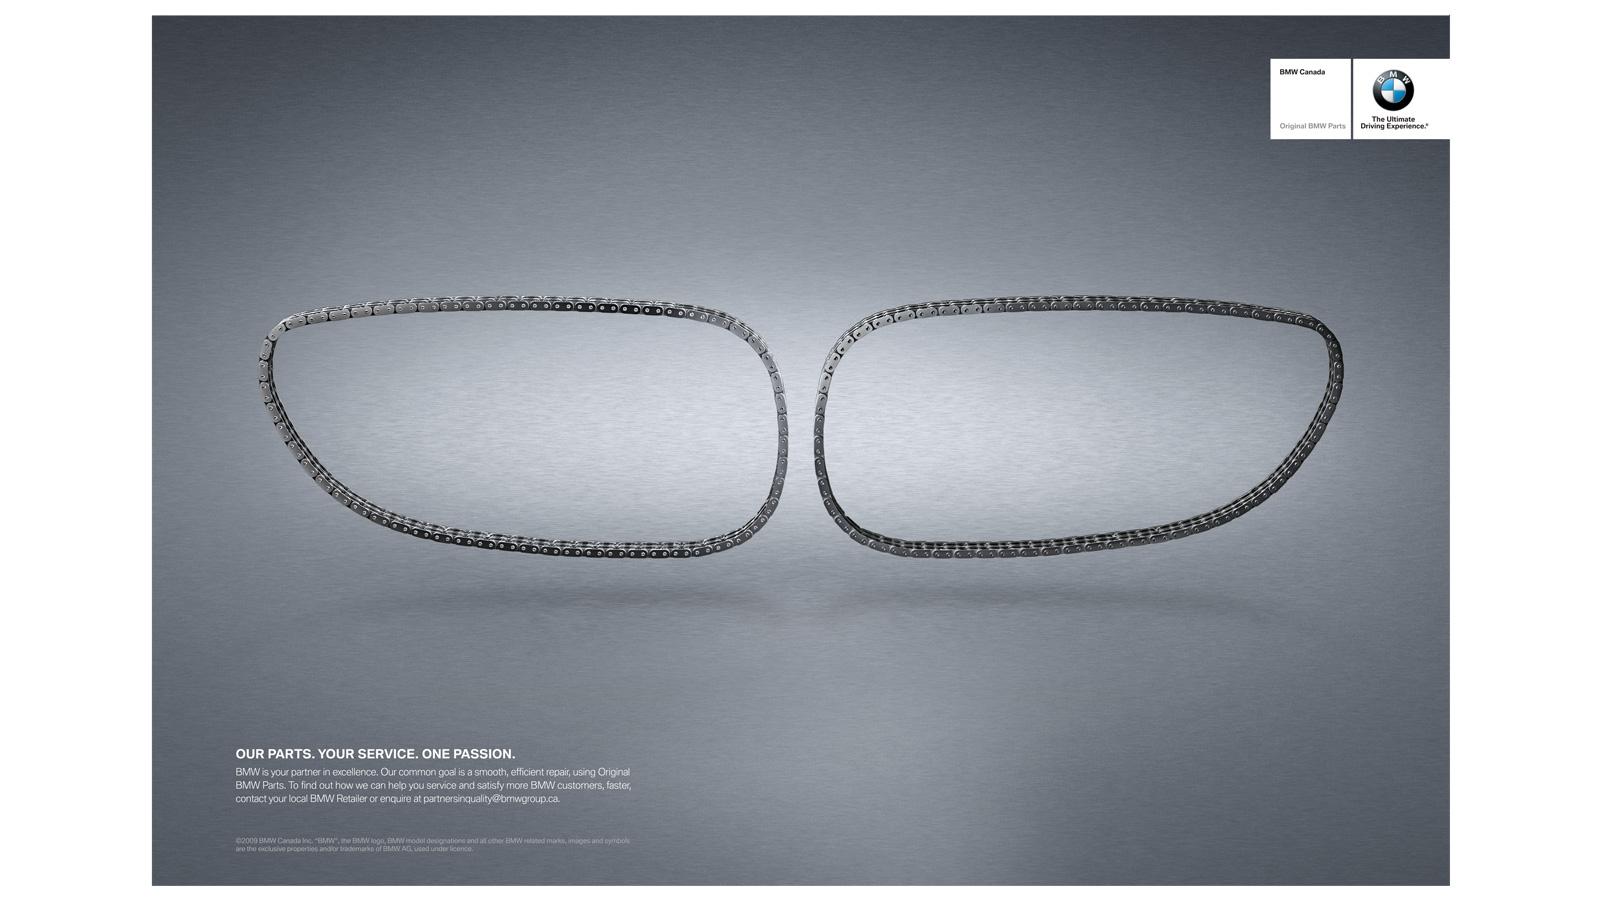 BMW Canada | BMW Parts & Services | Design